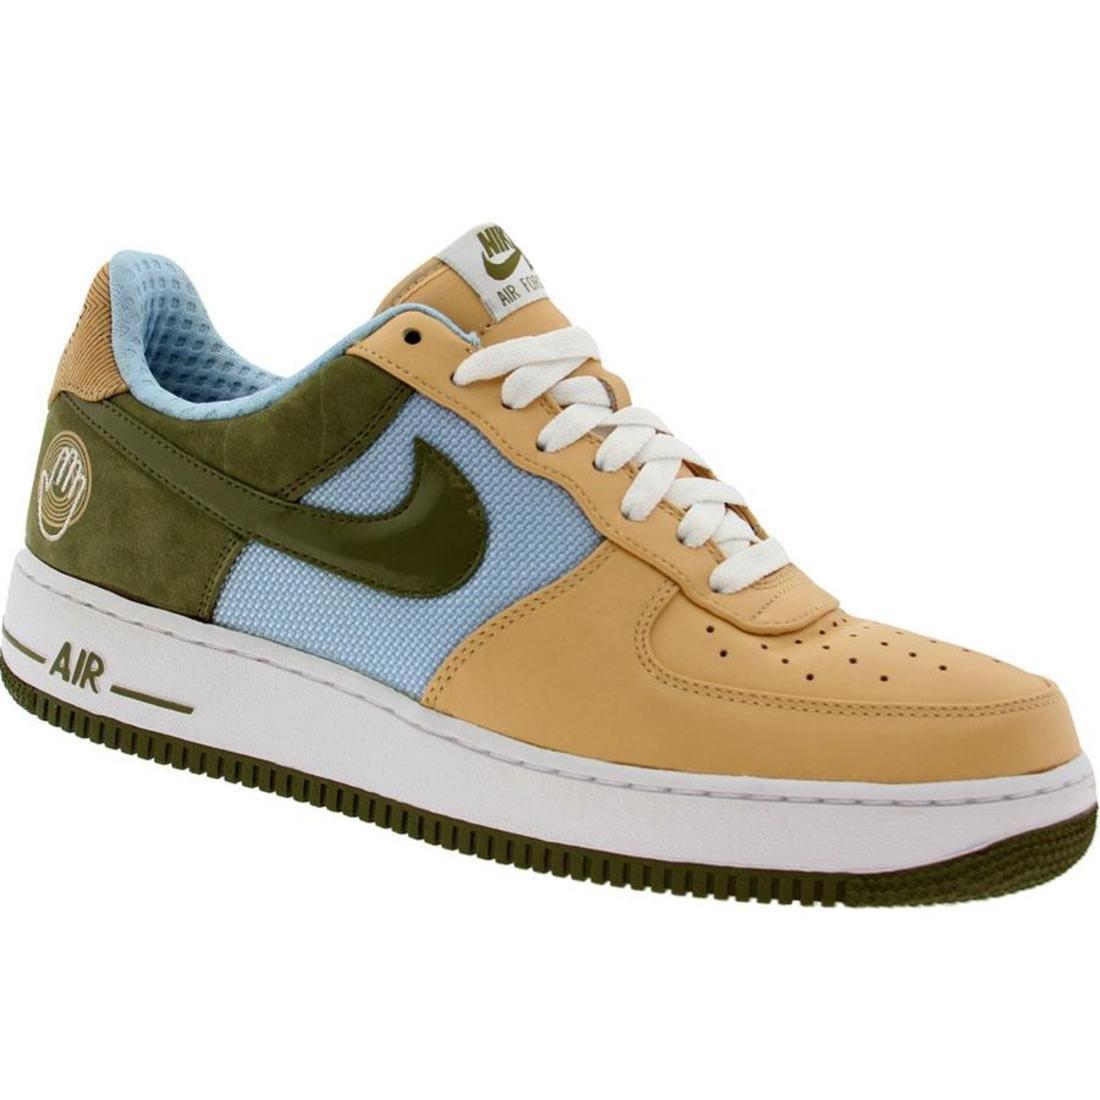 Nike Air Force 1 07 Low Premium Kool Bob Love 3 suede pilgrim ice blue Size 9.5 US by NIKE (Image #1)